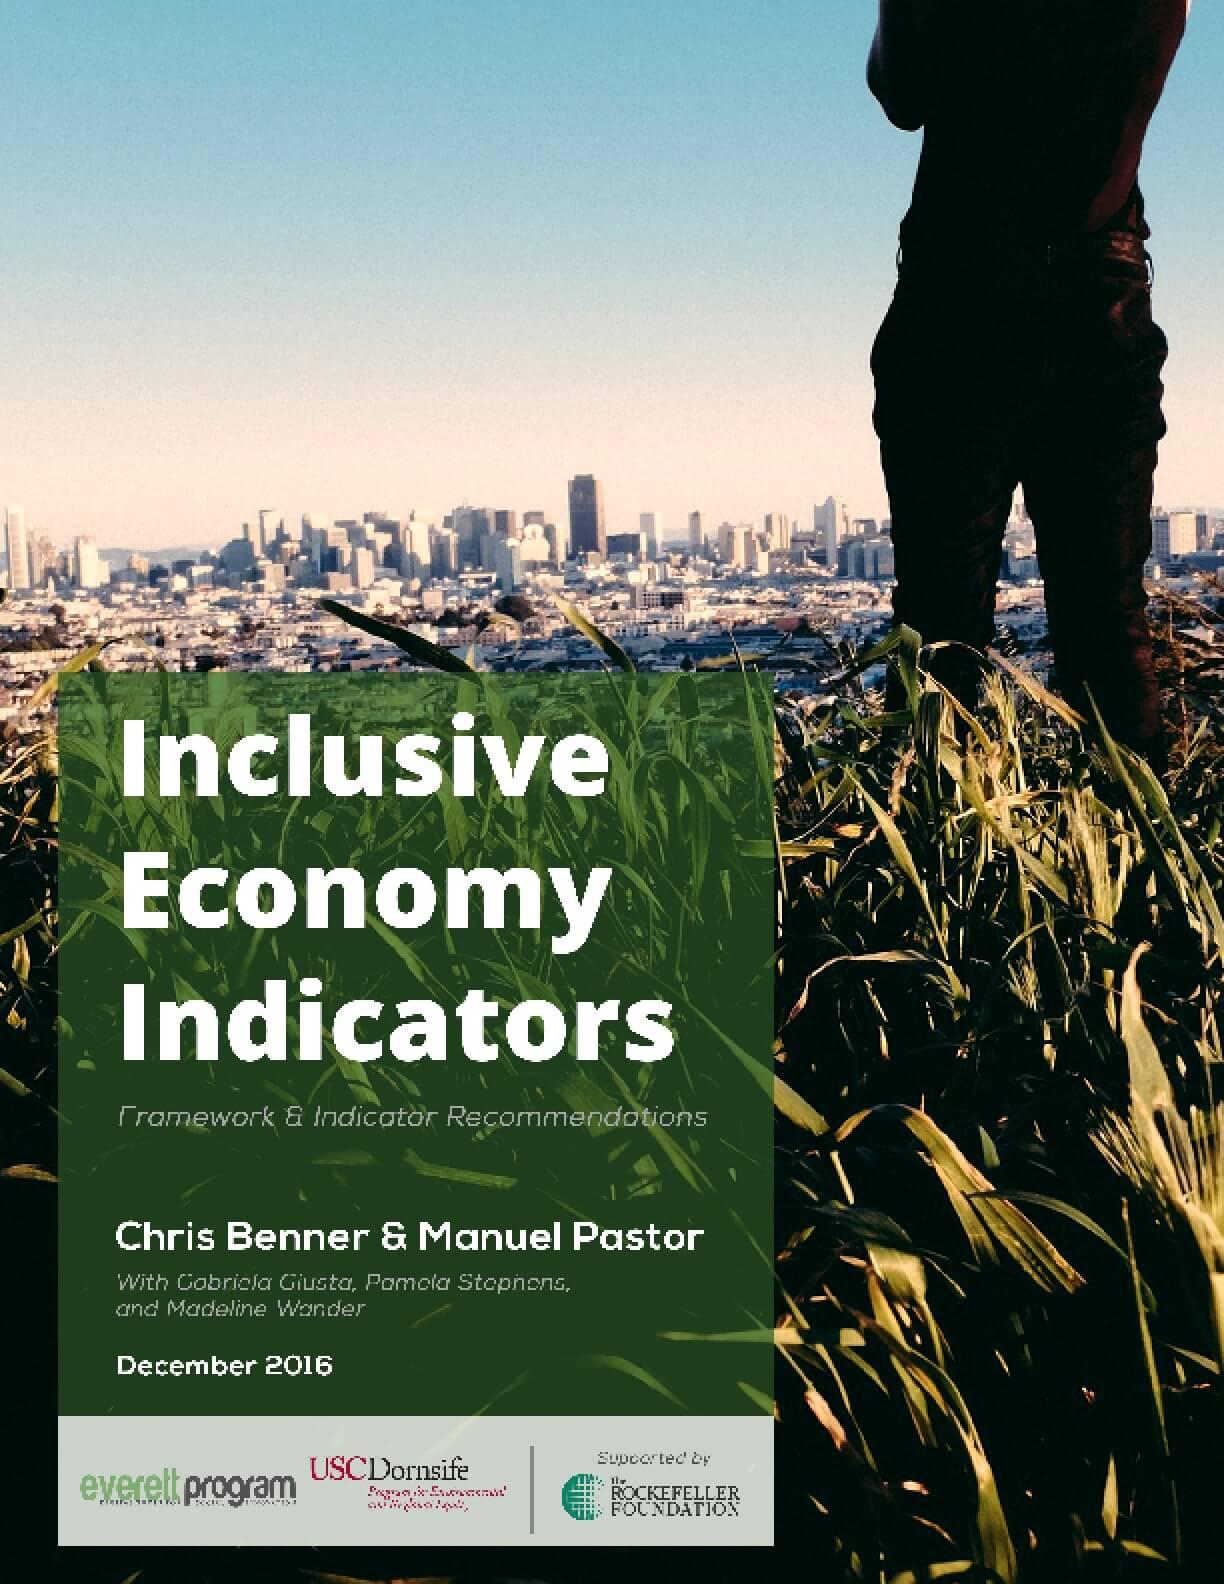 Inclusive Economy Indicators: Framework & Indicator Recommendations